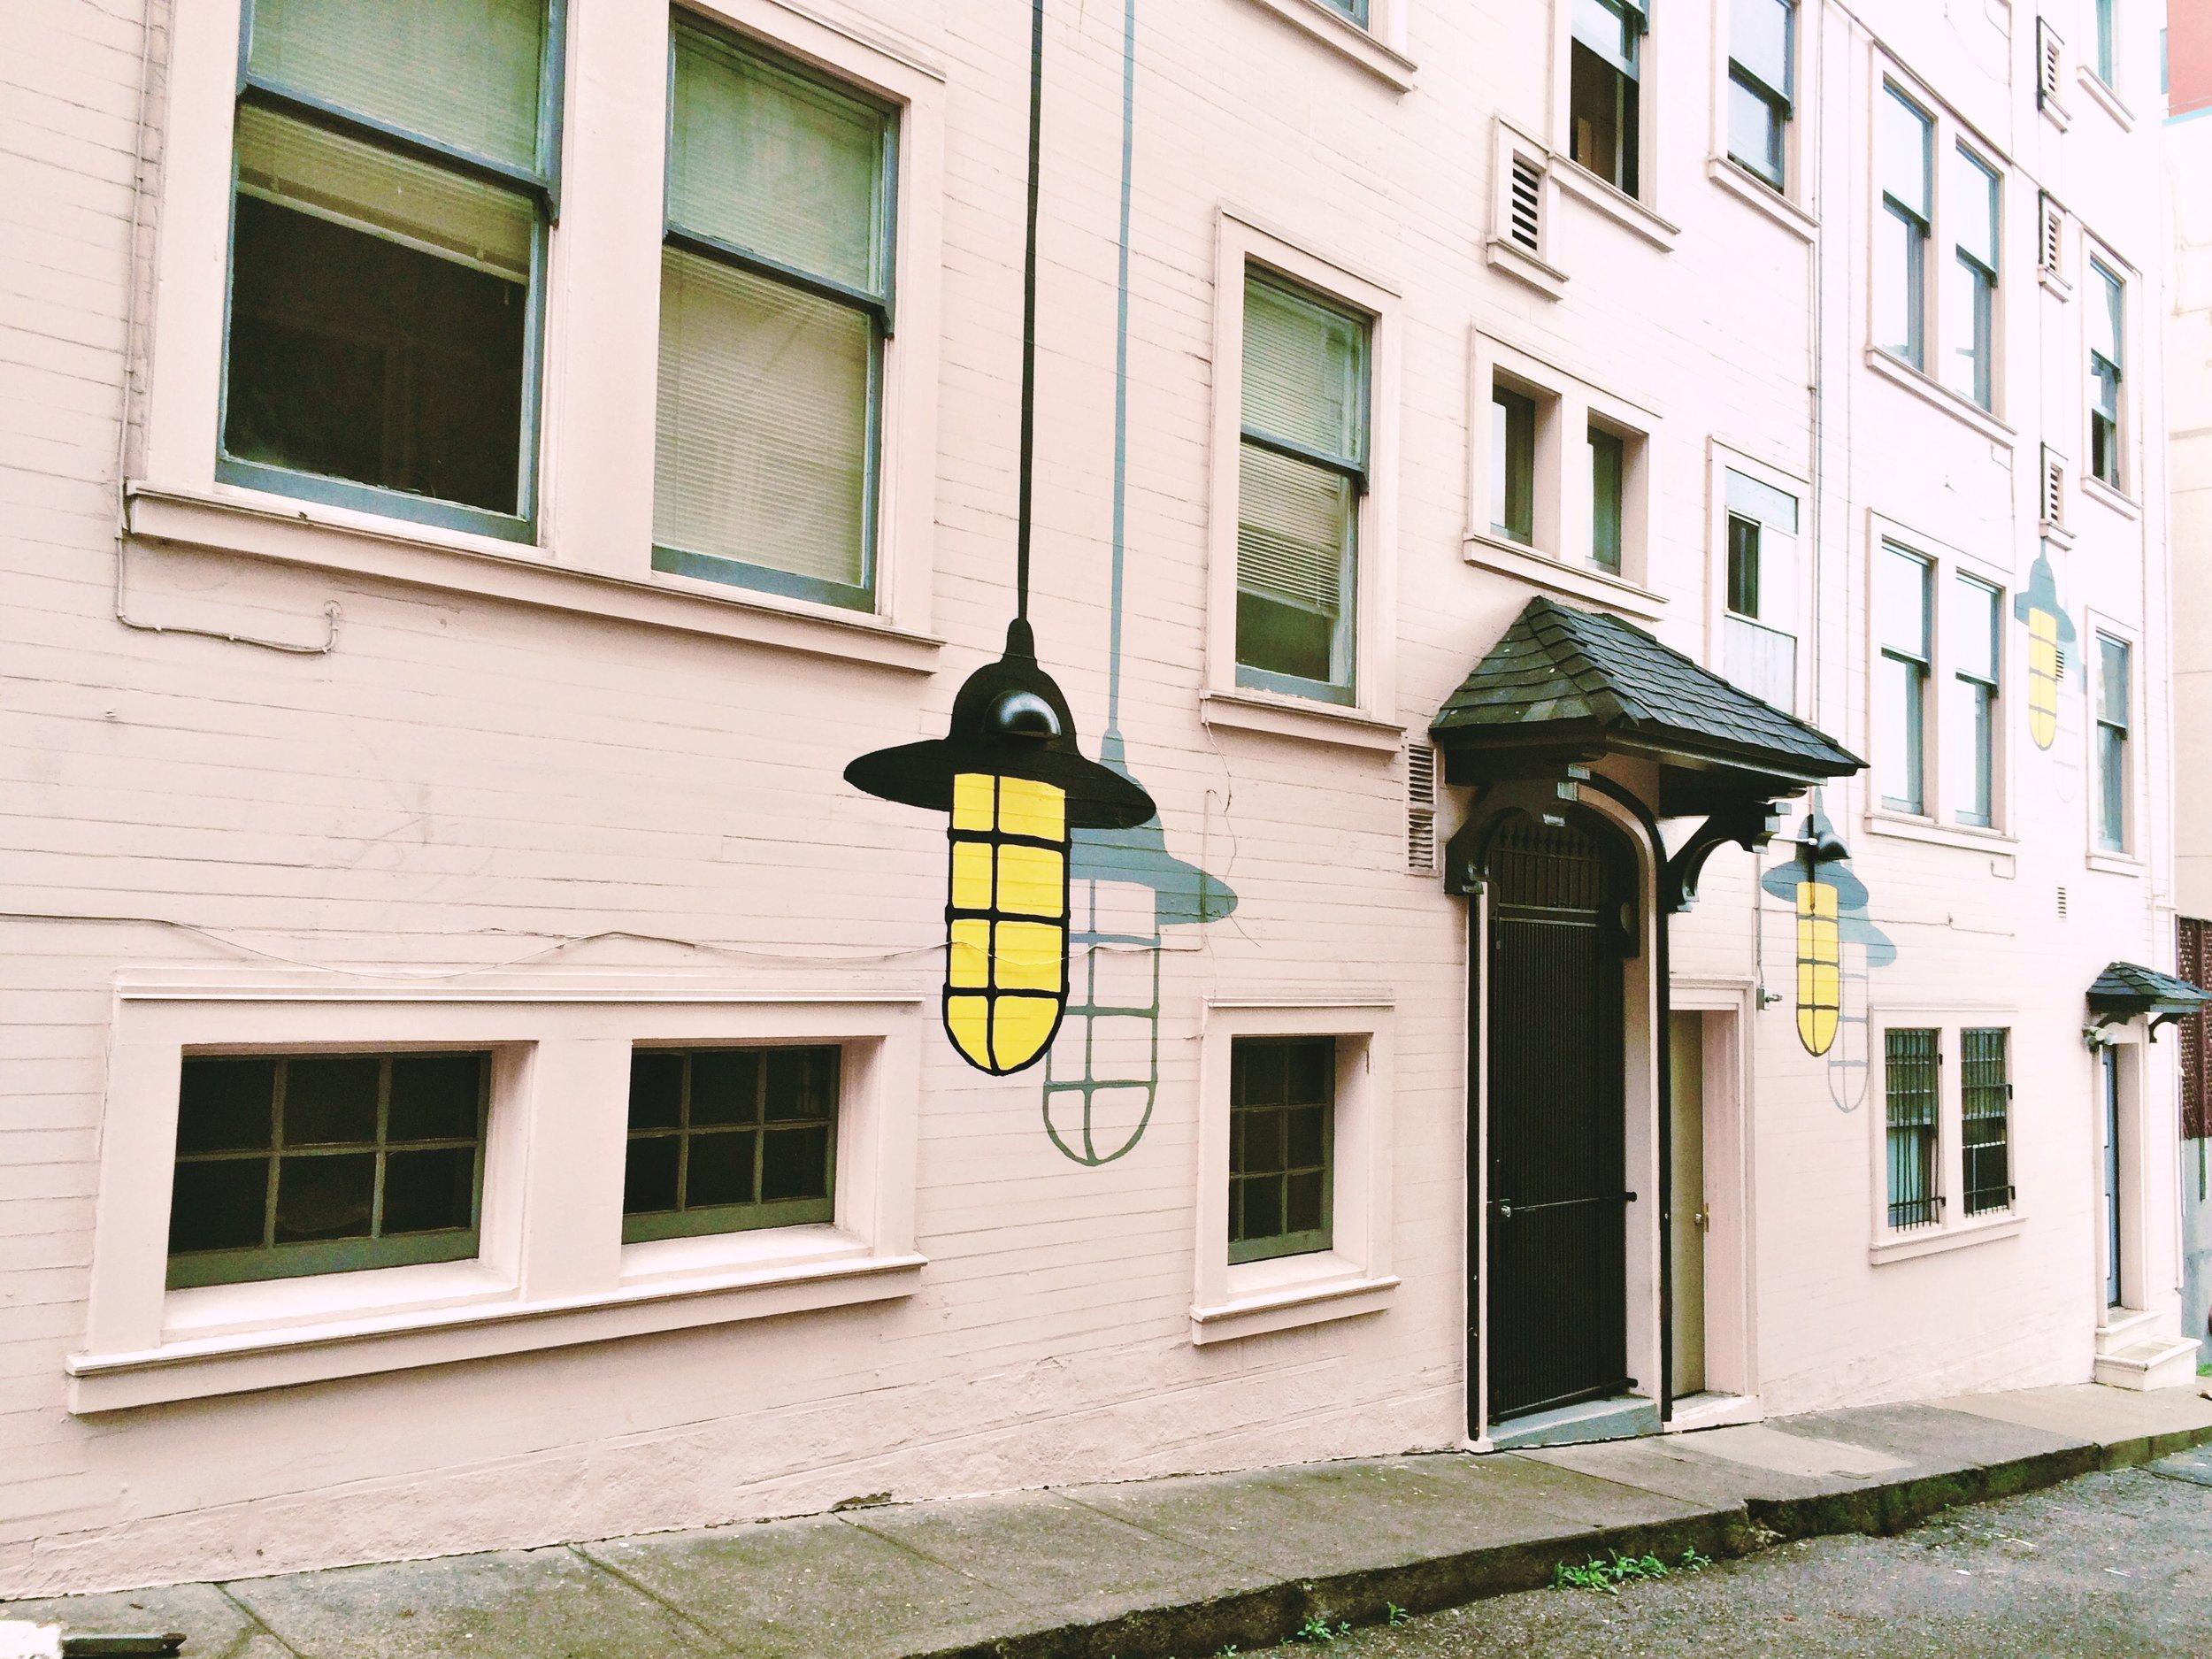 Bright Idea Street Art SF